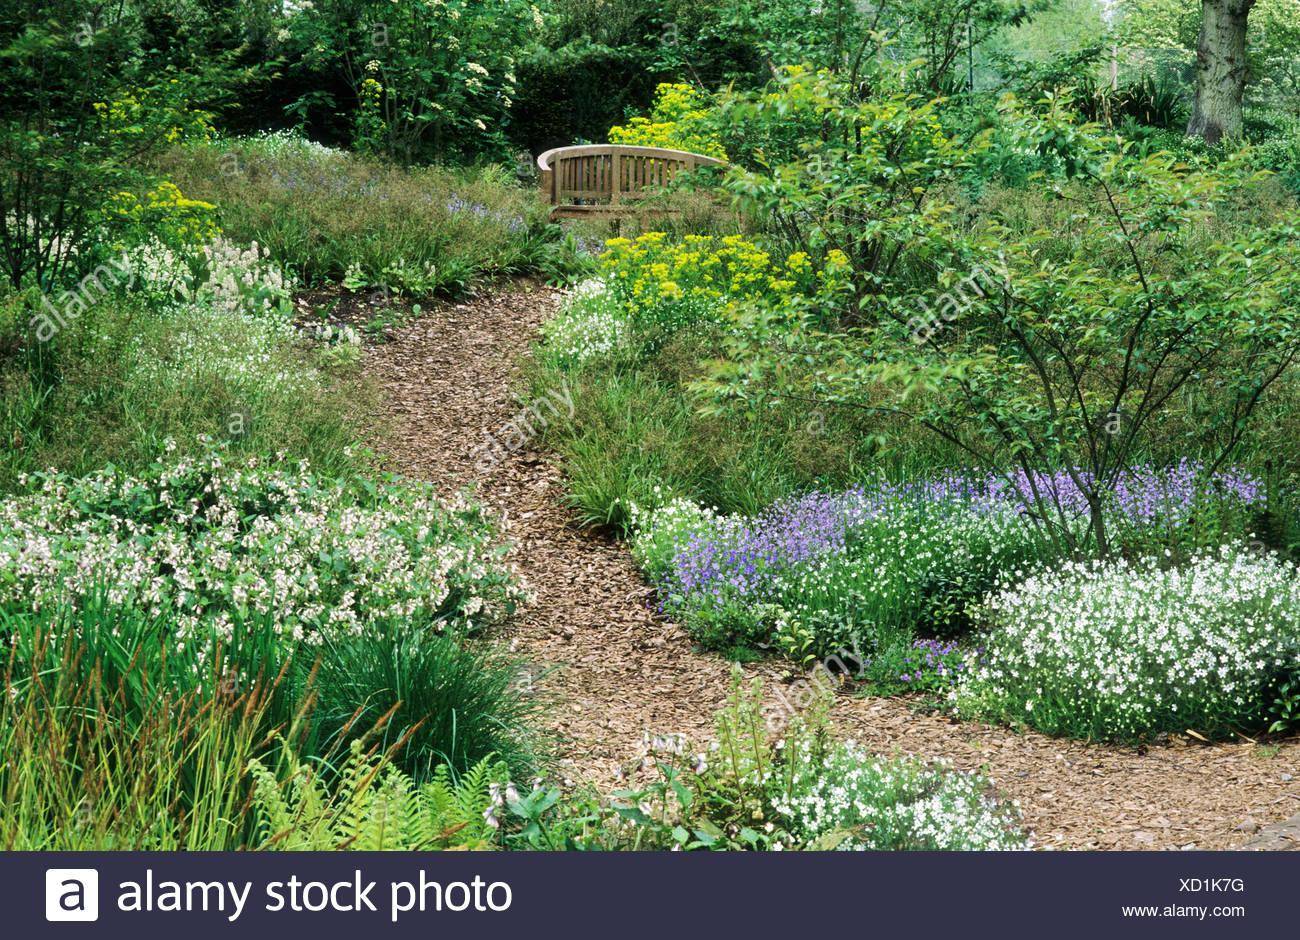 Wald Garten Rinde Hackschnitzel Pfad Symphytum Pulmonaria